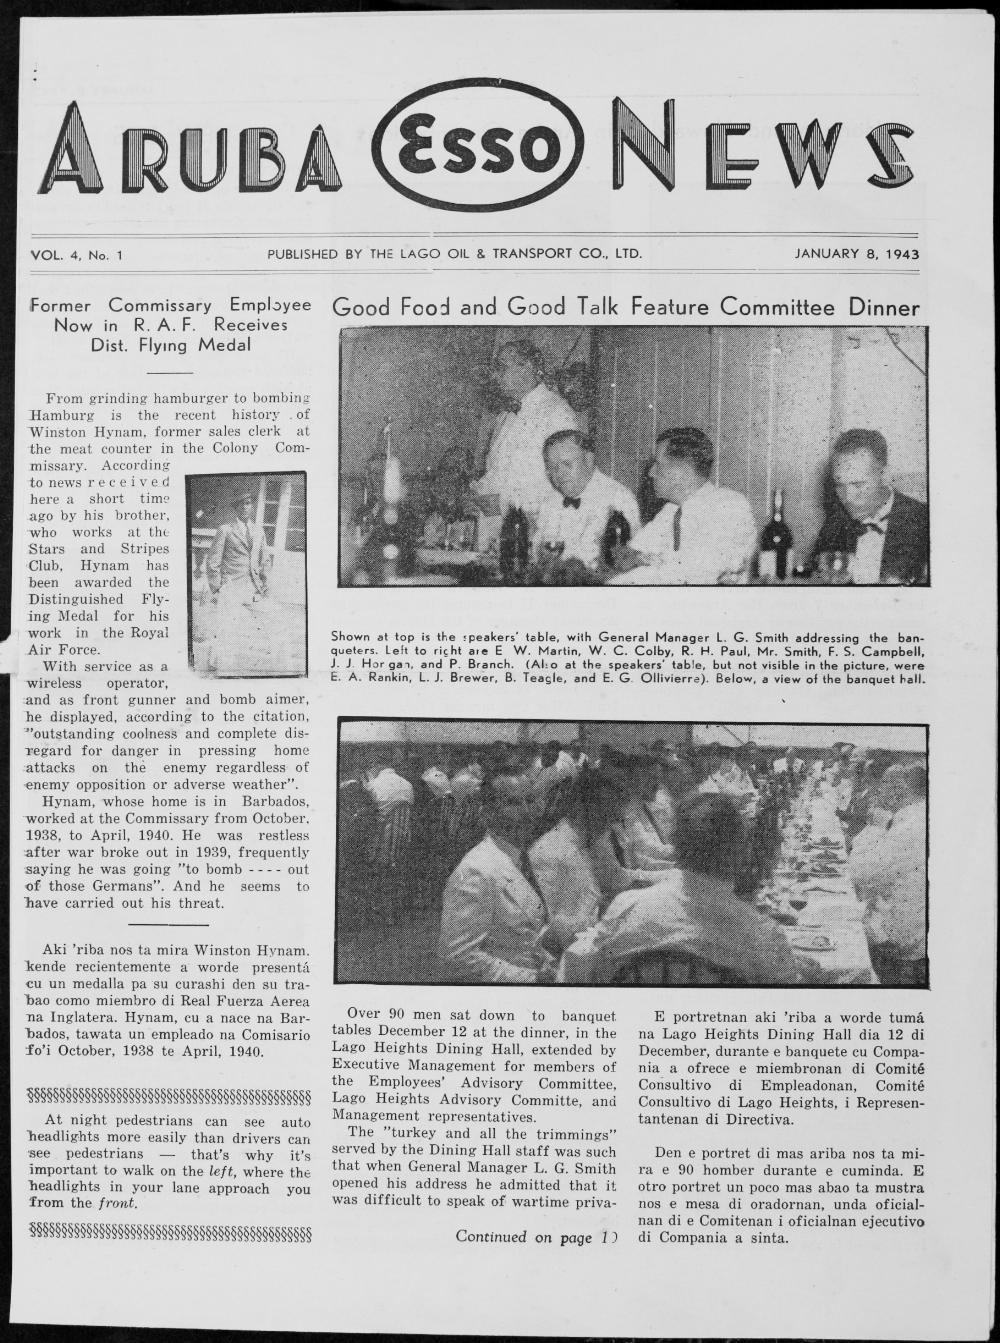 Aruba Esso News - Page 1